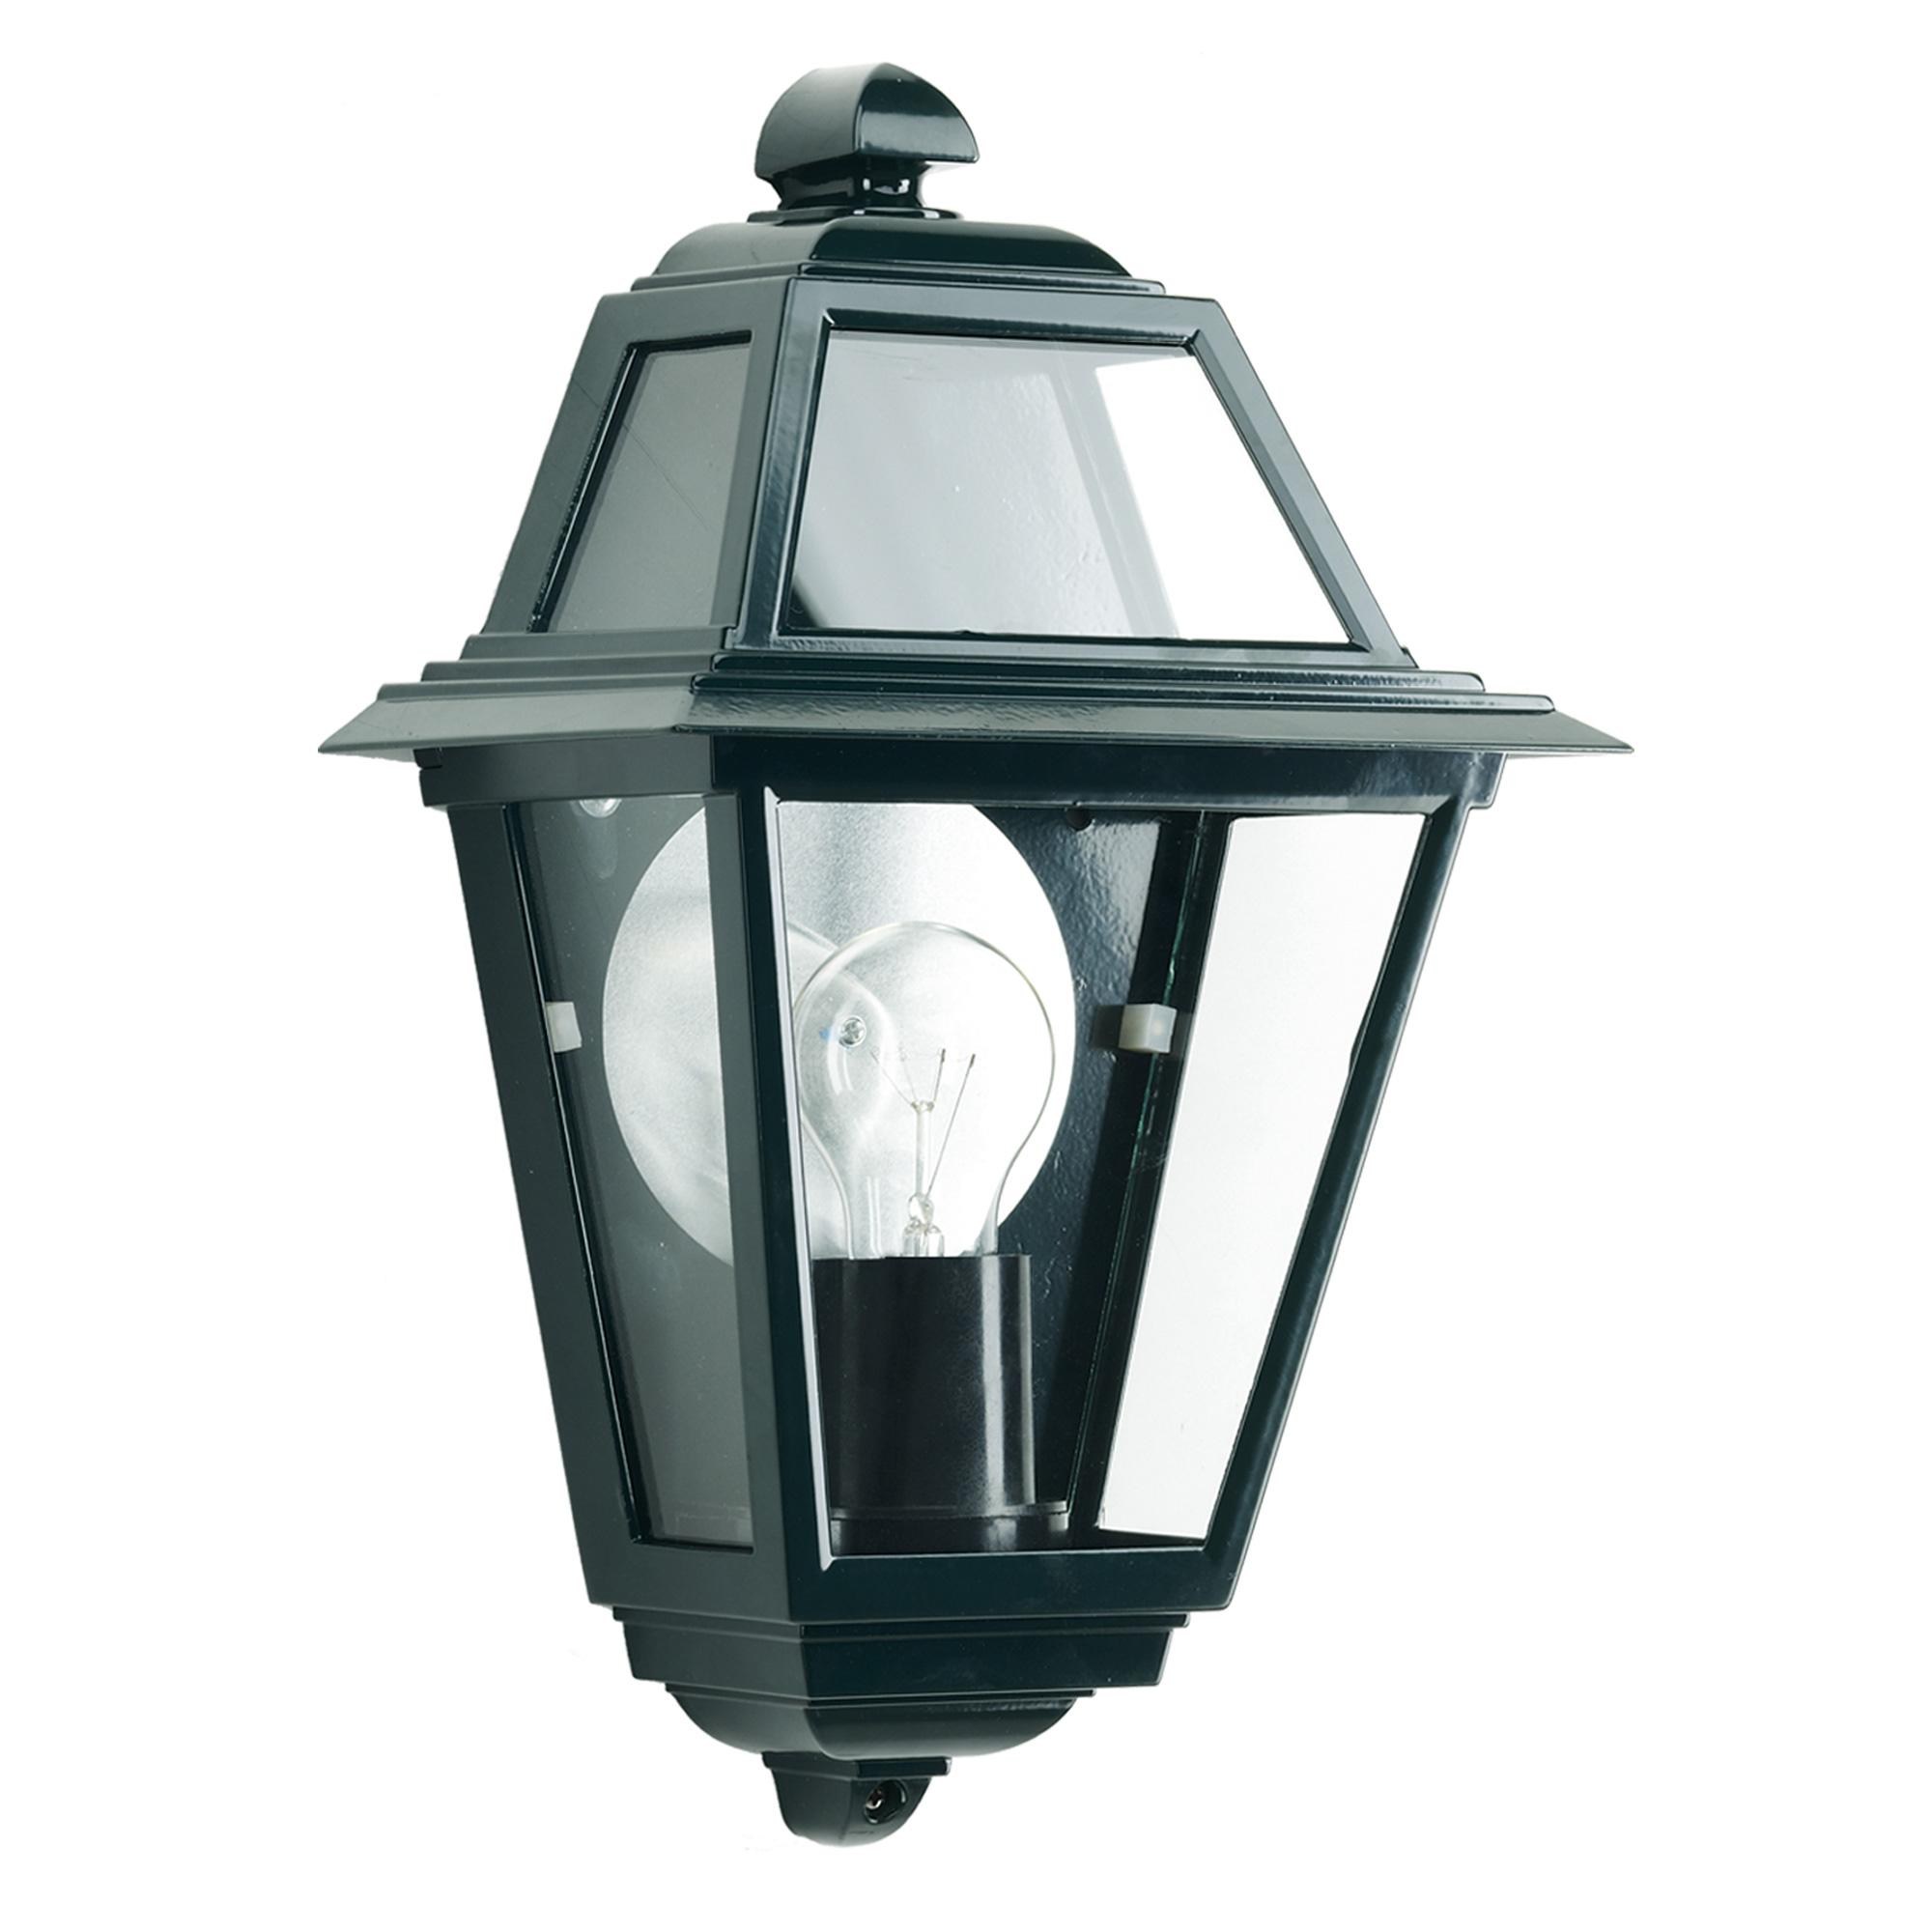 Buitenlamp Beek Dag Nacht Schemersensor LED